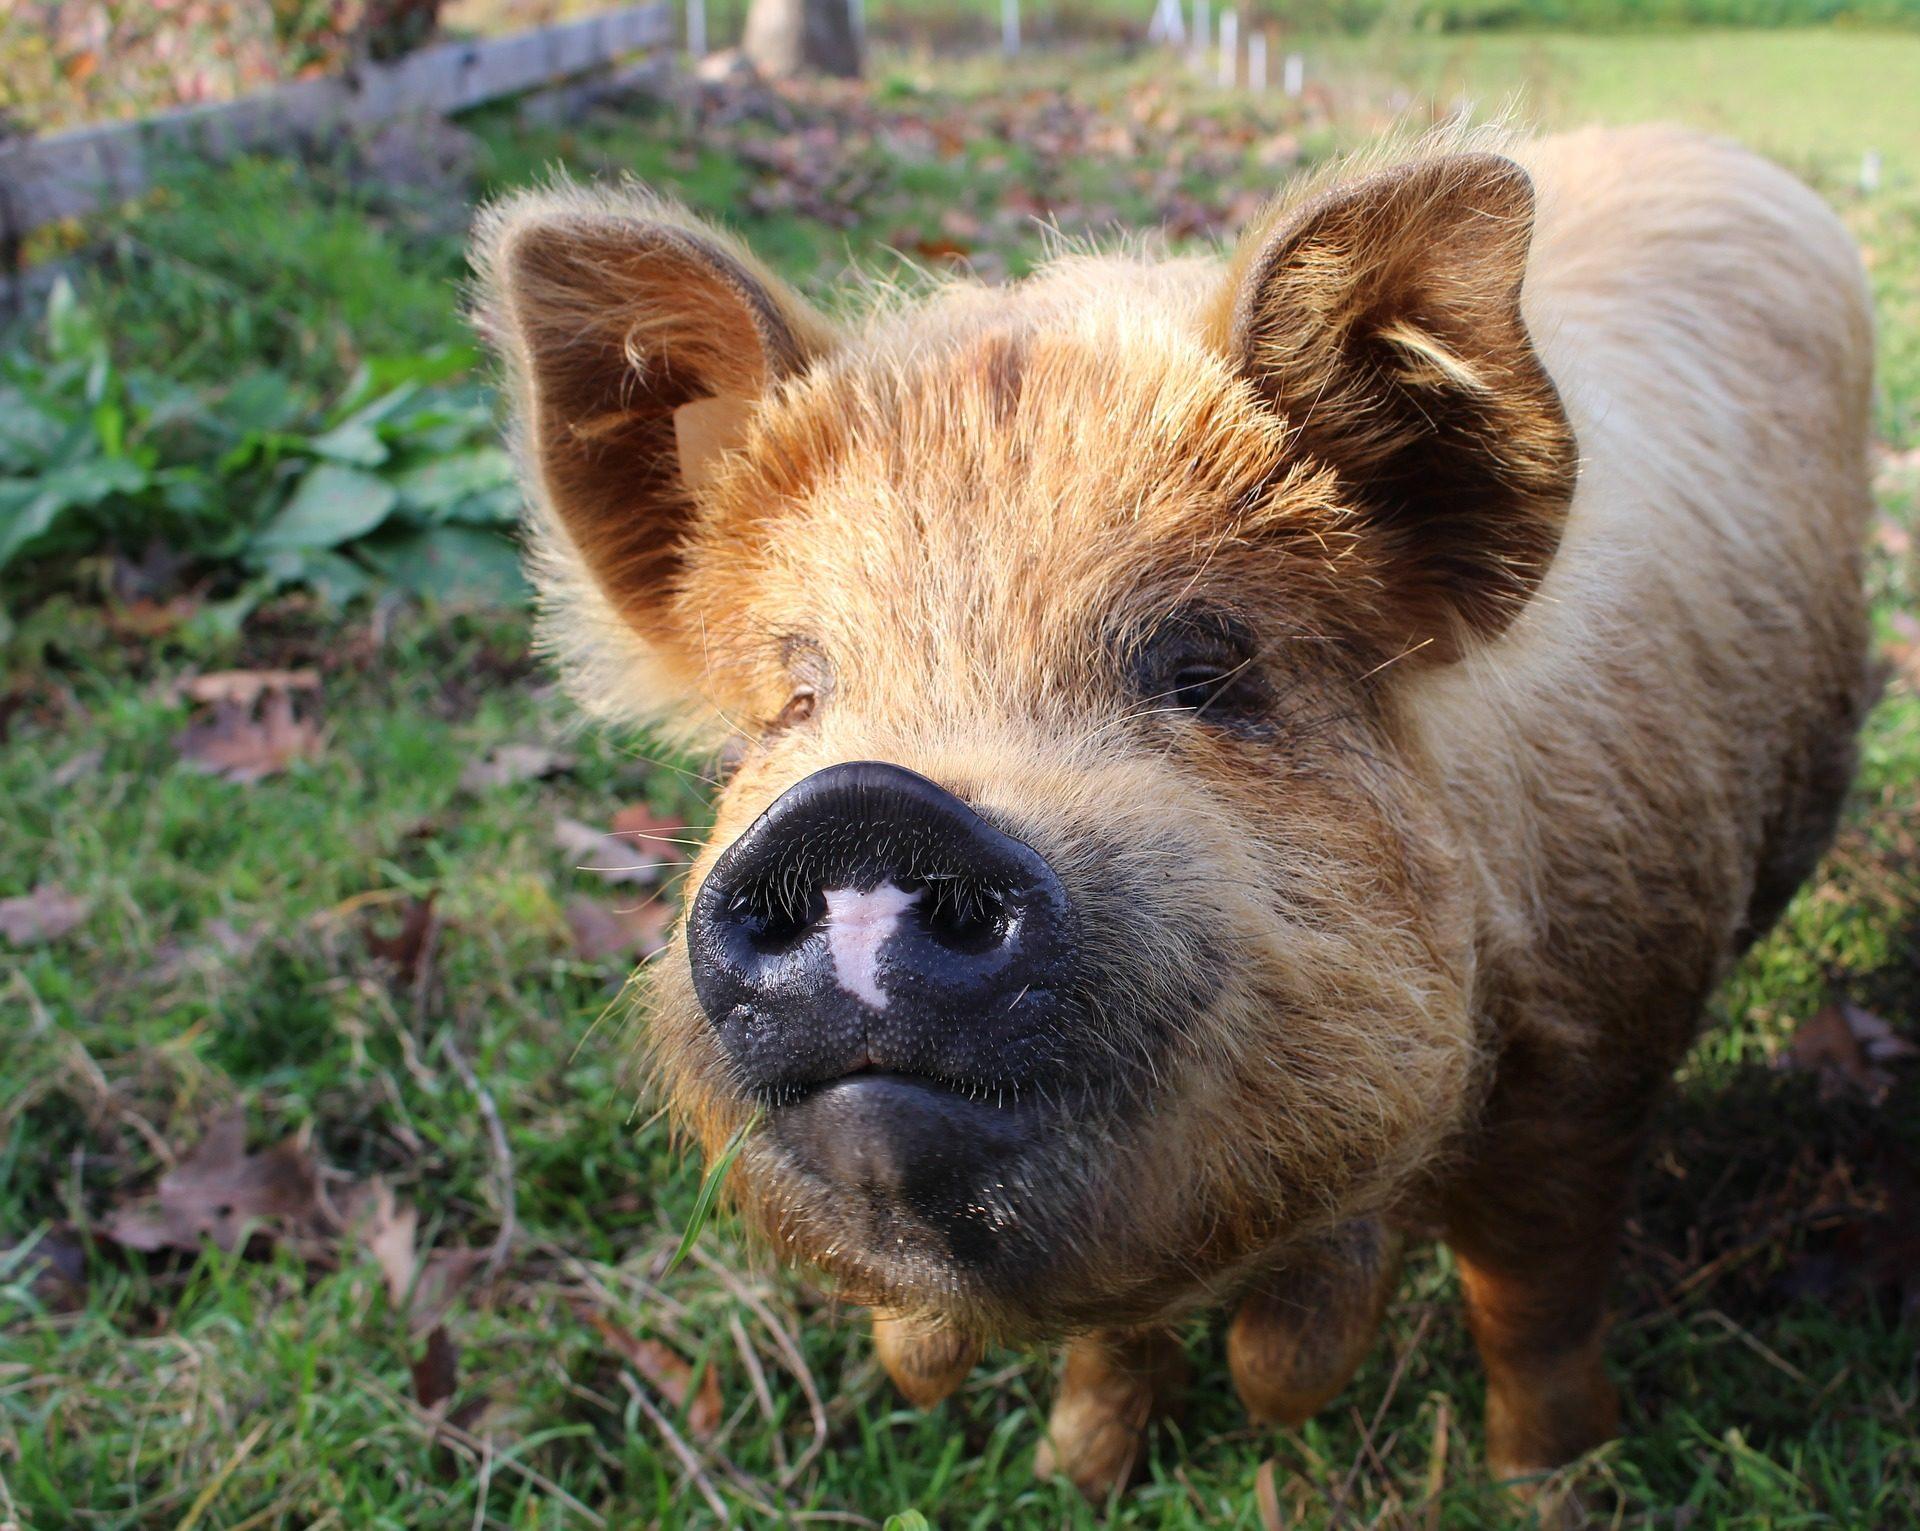 cerdo, 猪, puer猪肉�子, 山, 耳朵 - 高清壁纸 - 教授-falken.com